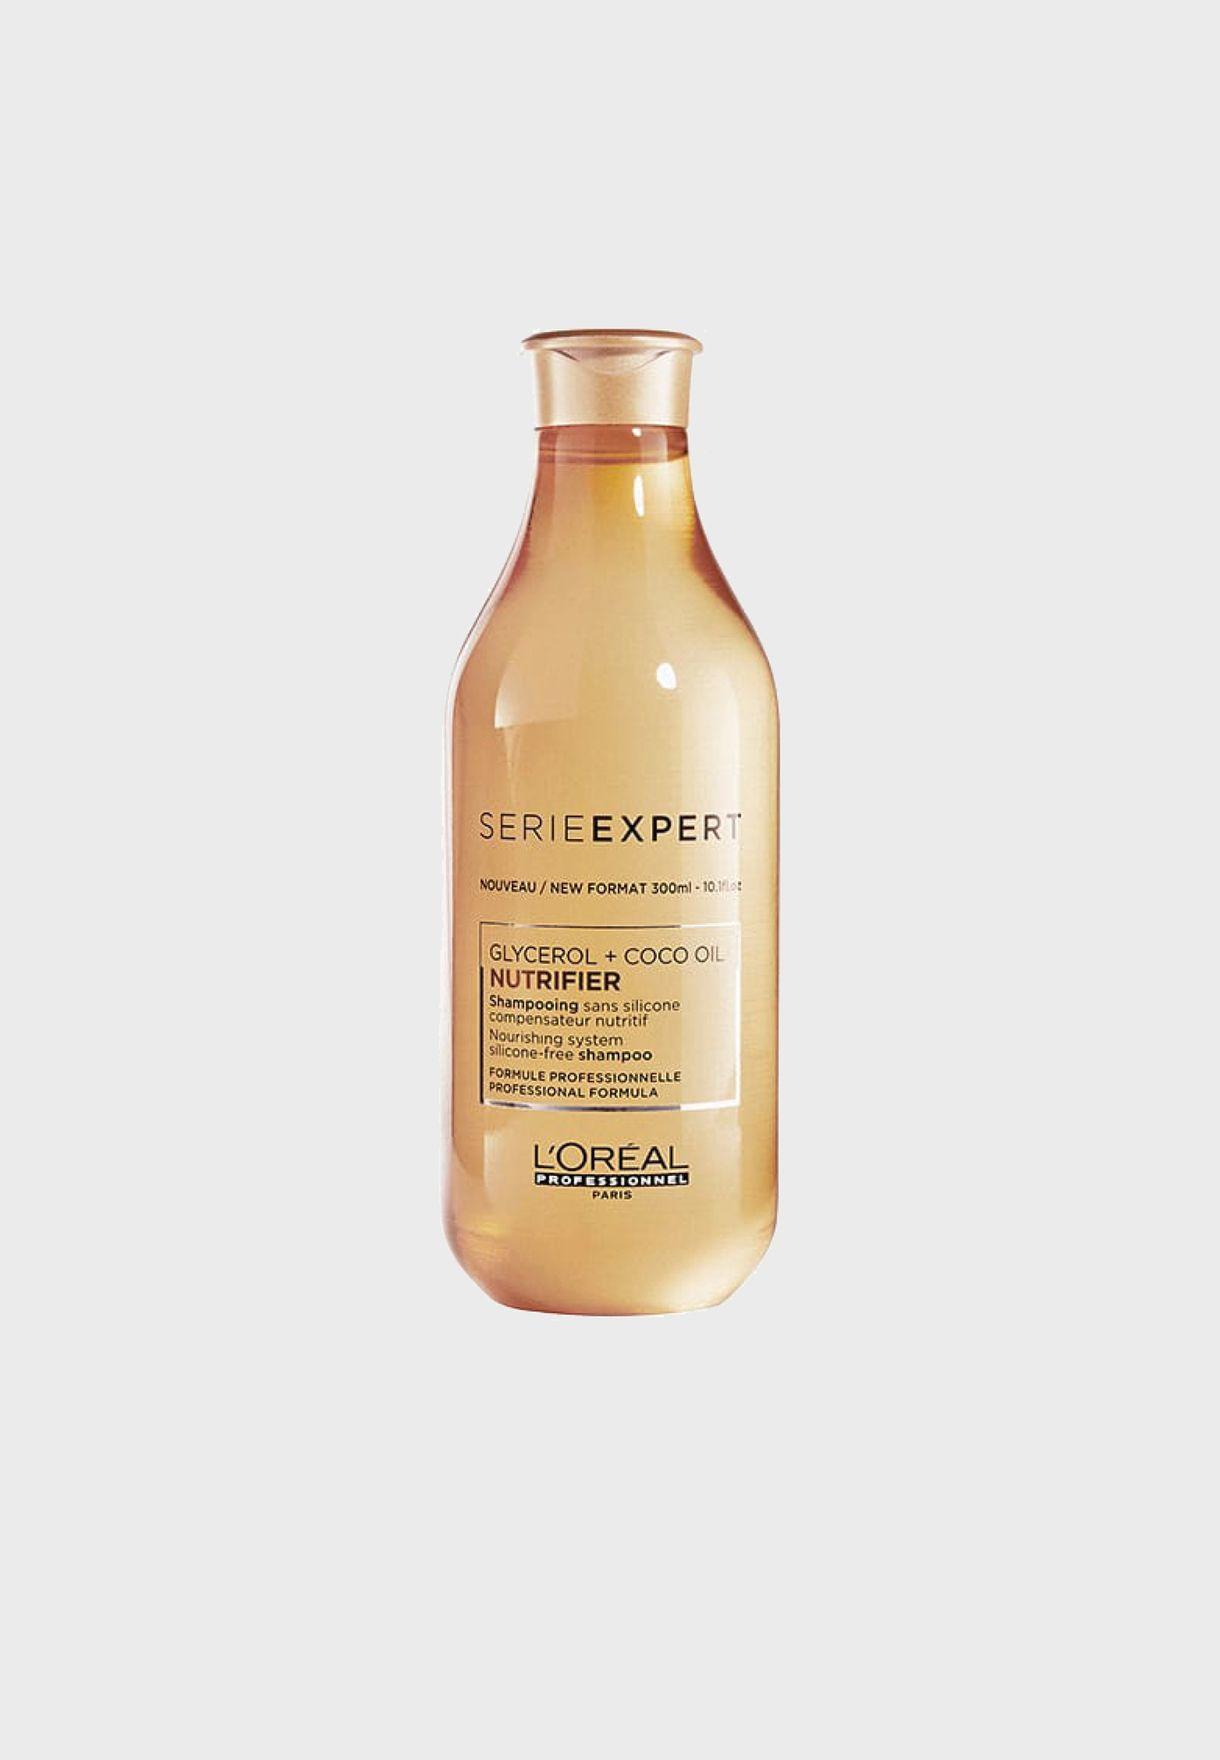 Serie Expert- Nutrifier Shampoo